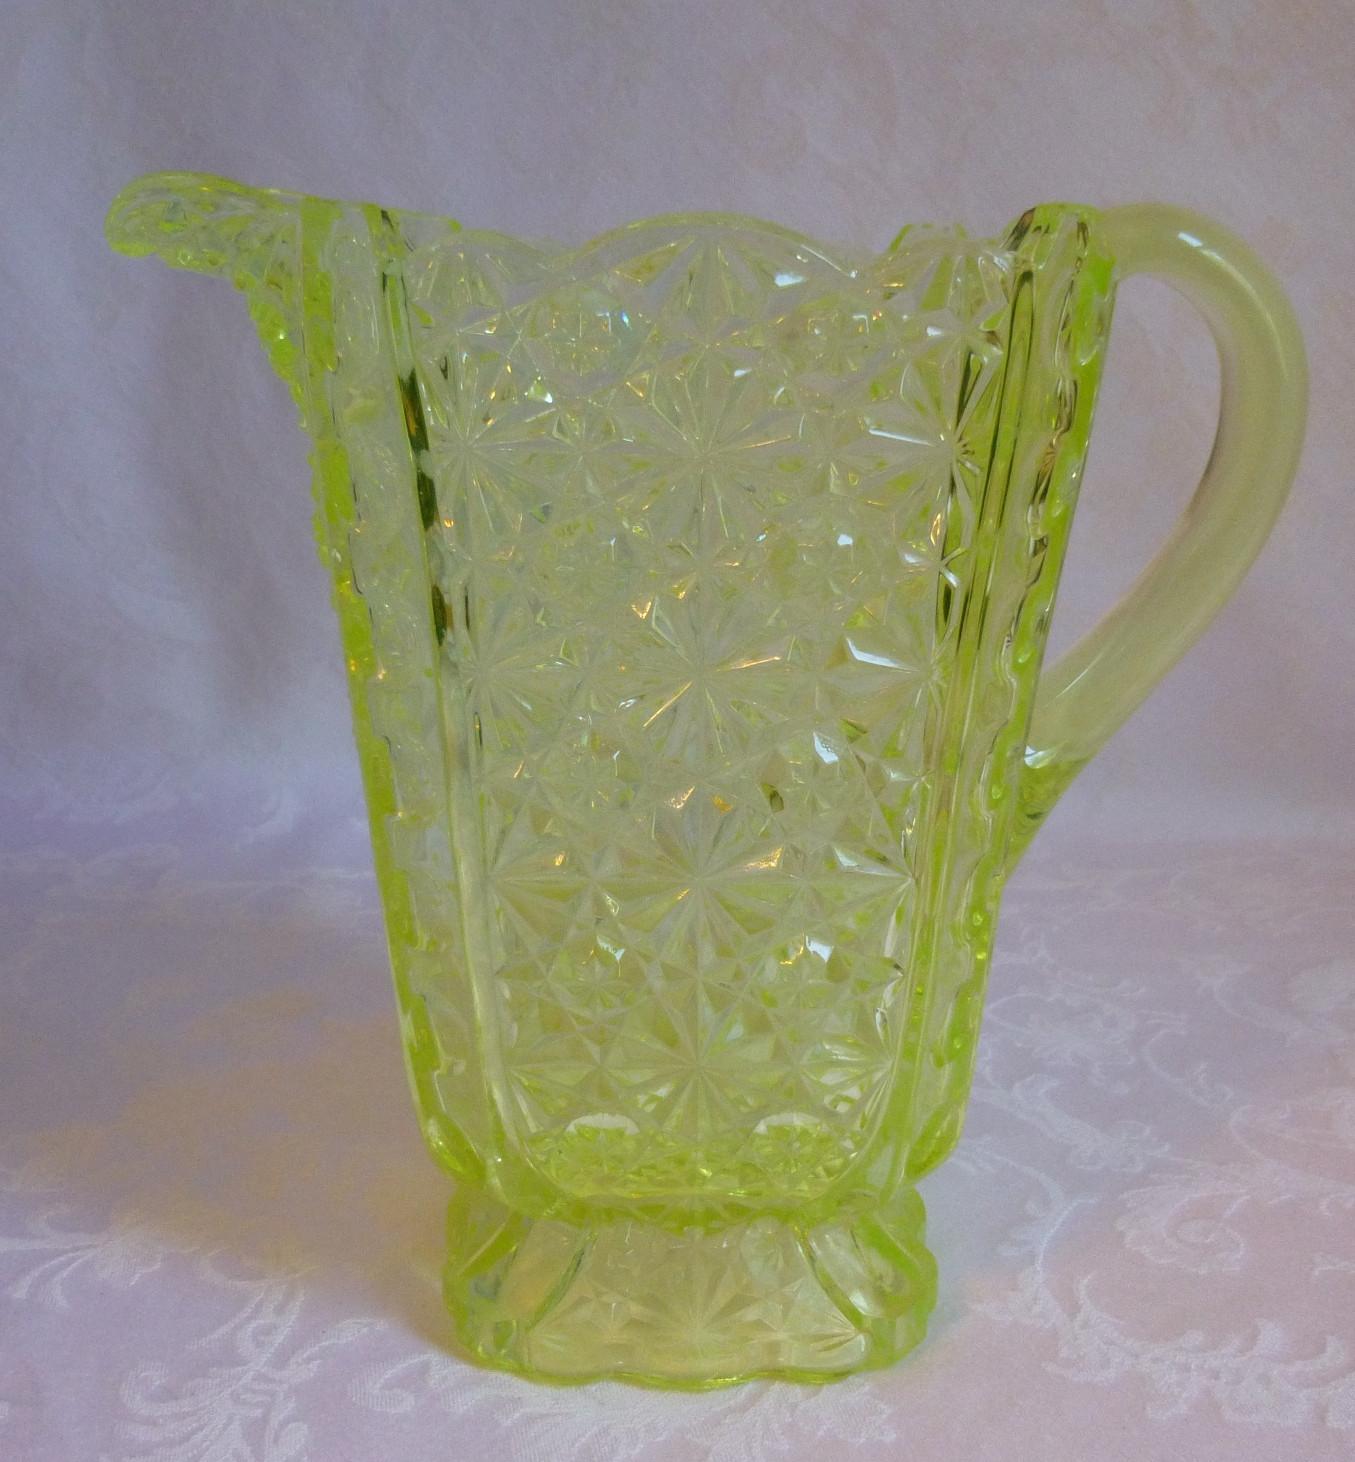 19 Recommended Lenox Bud Vase Gold Trim